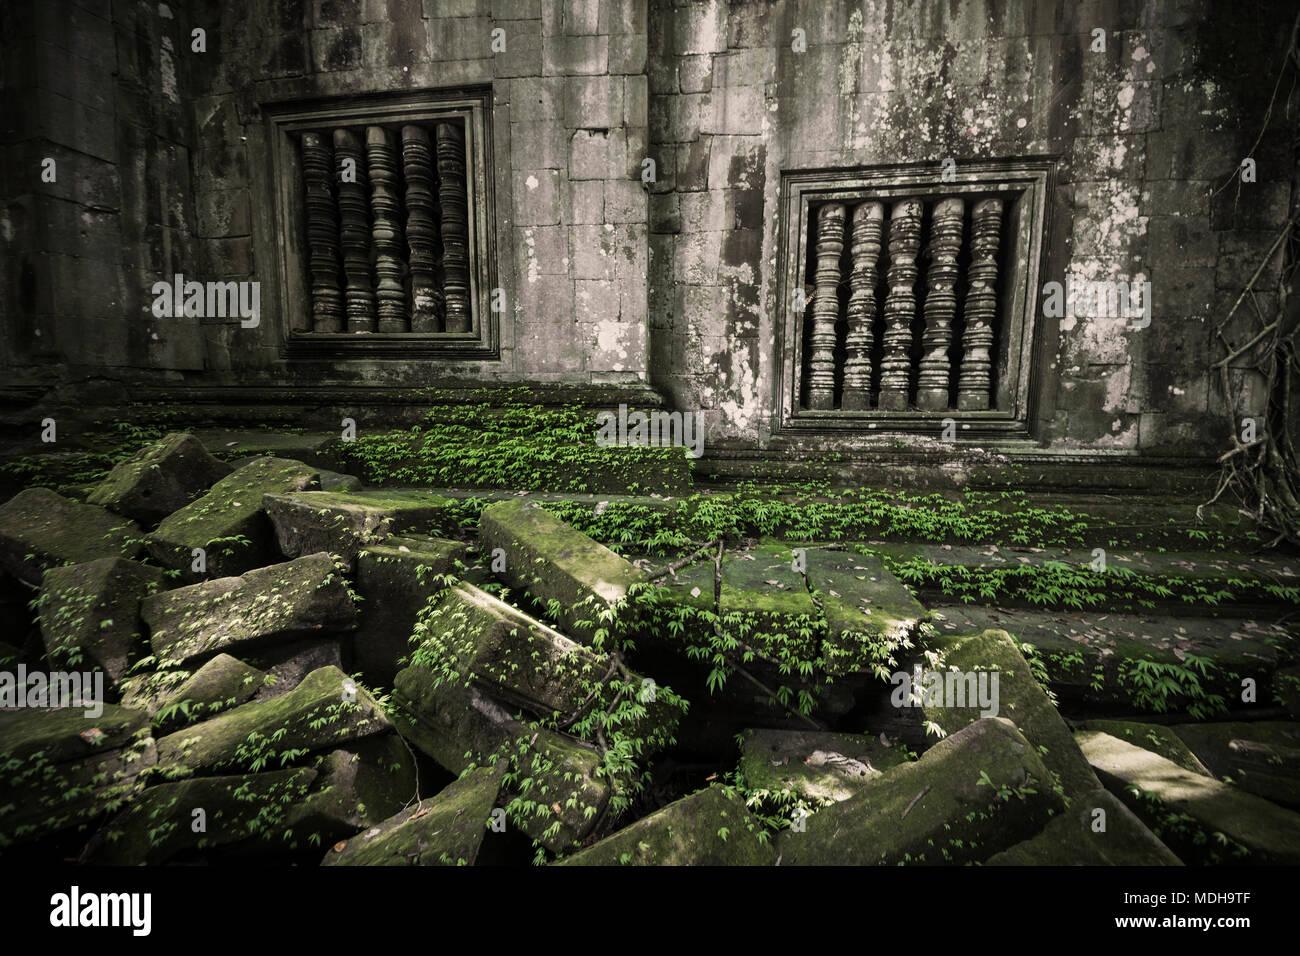 Balustraded windows at the ruins of Beng Meala; Siem Reap, Cambodia - Stock Image